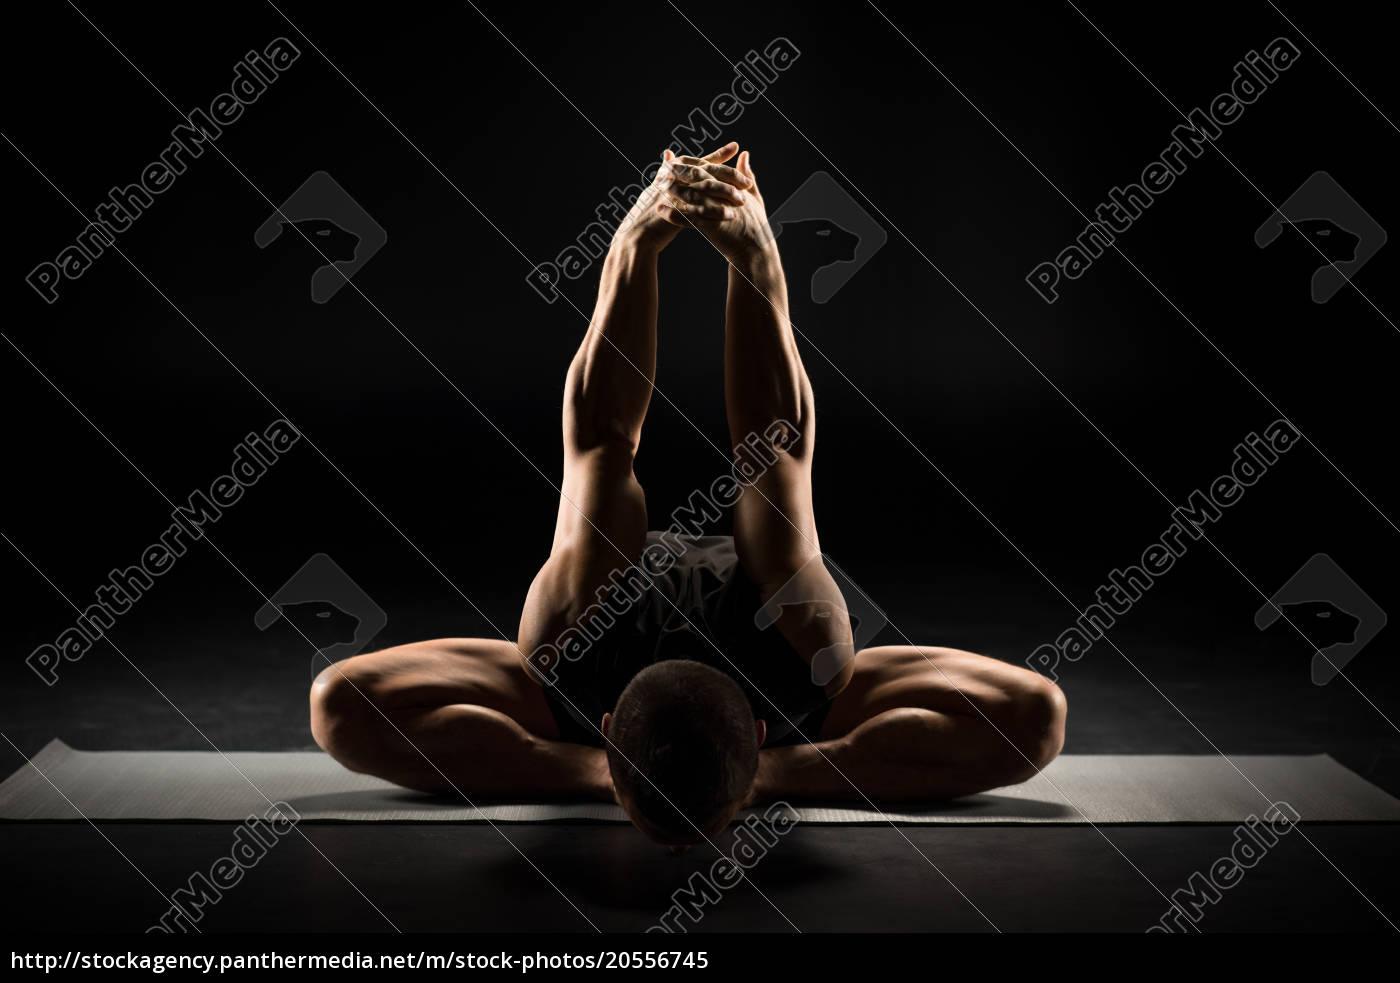 man, sitting, in, yoga, position - 20556745